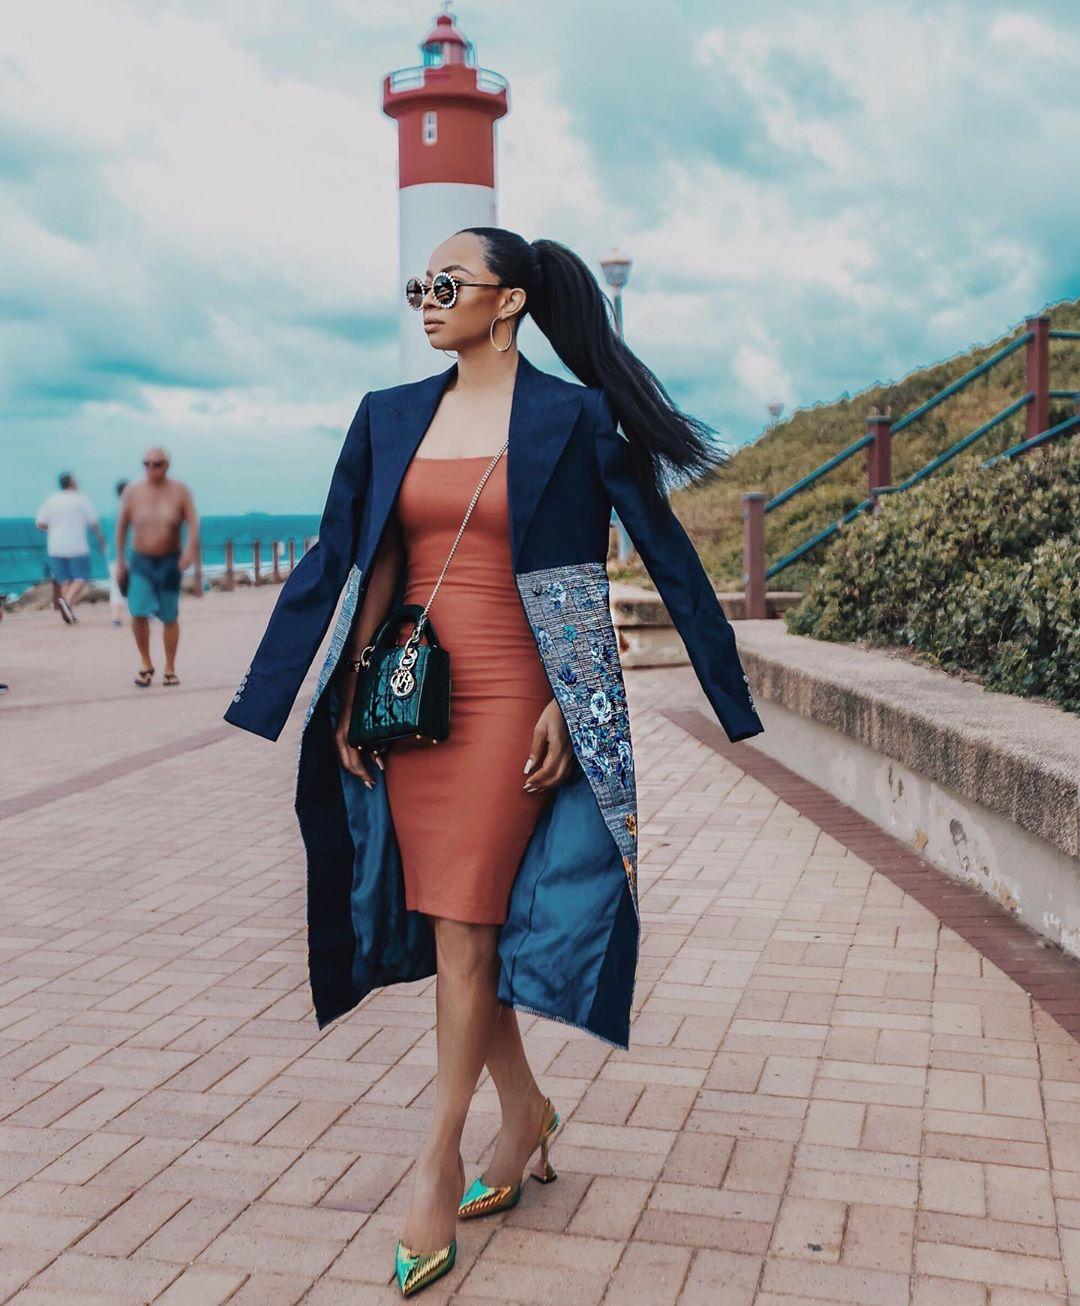 toke-makinwa-african-celeb-style-Nigerian-celebrity